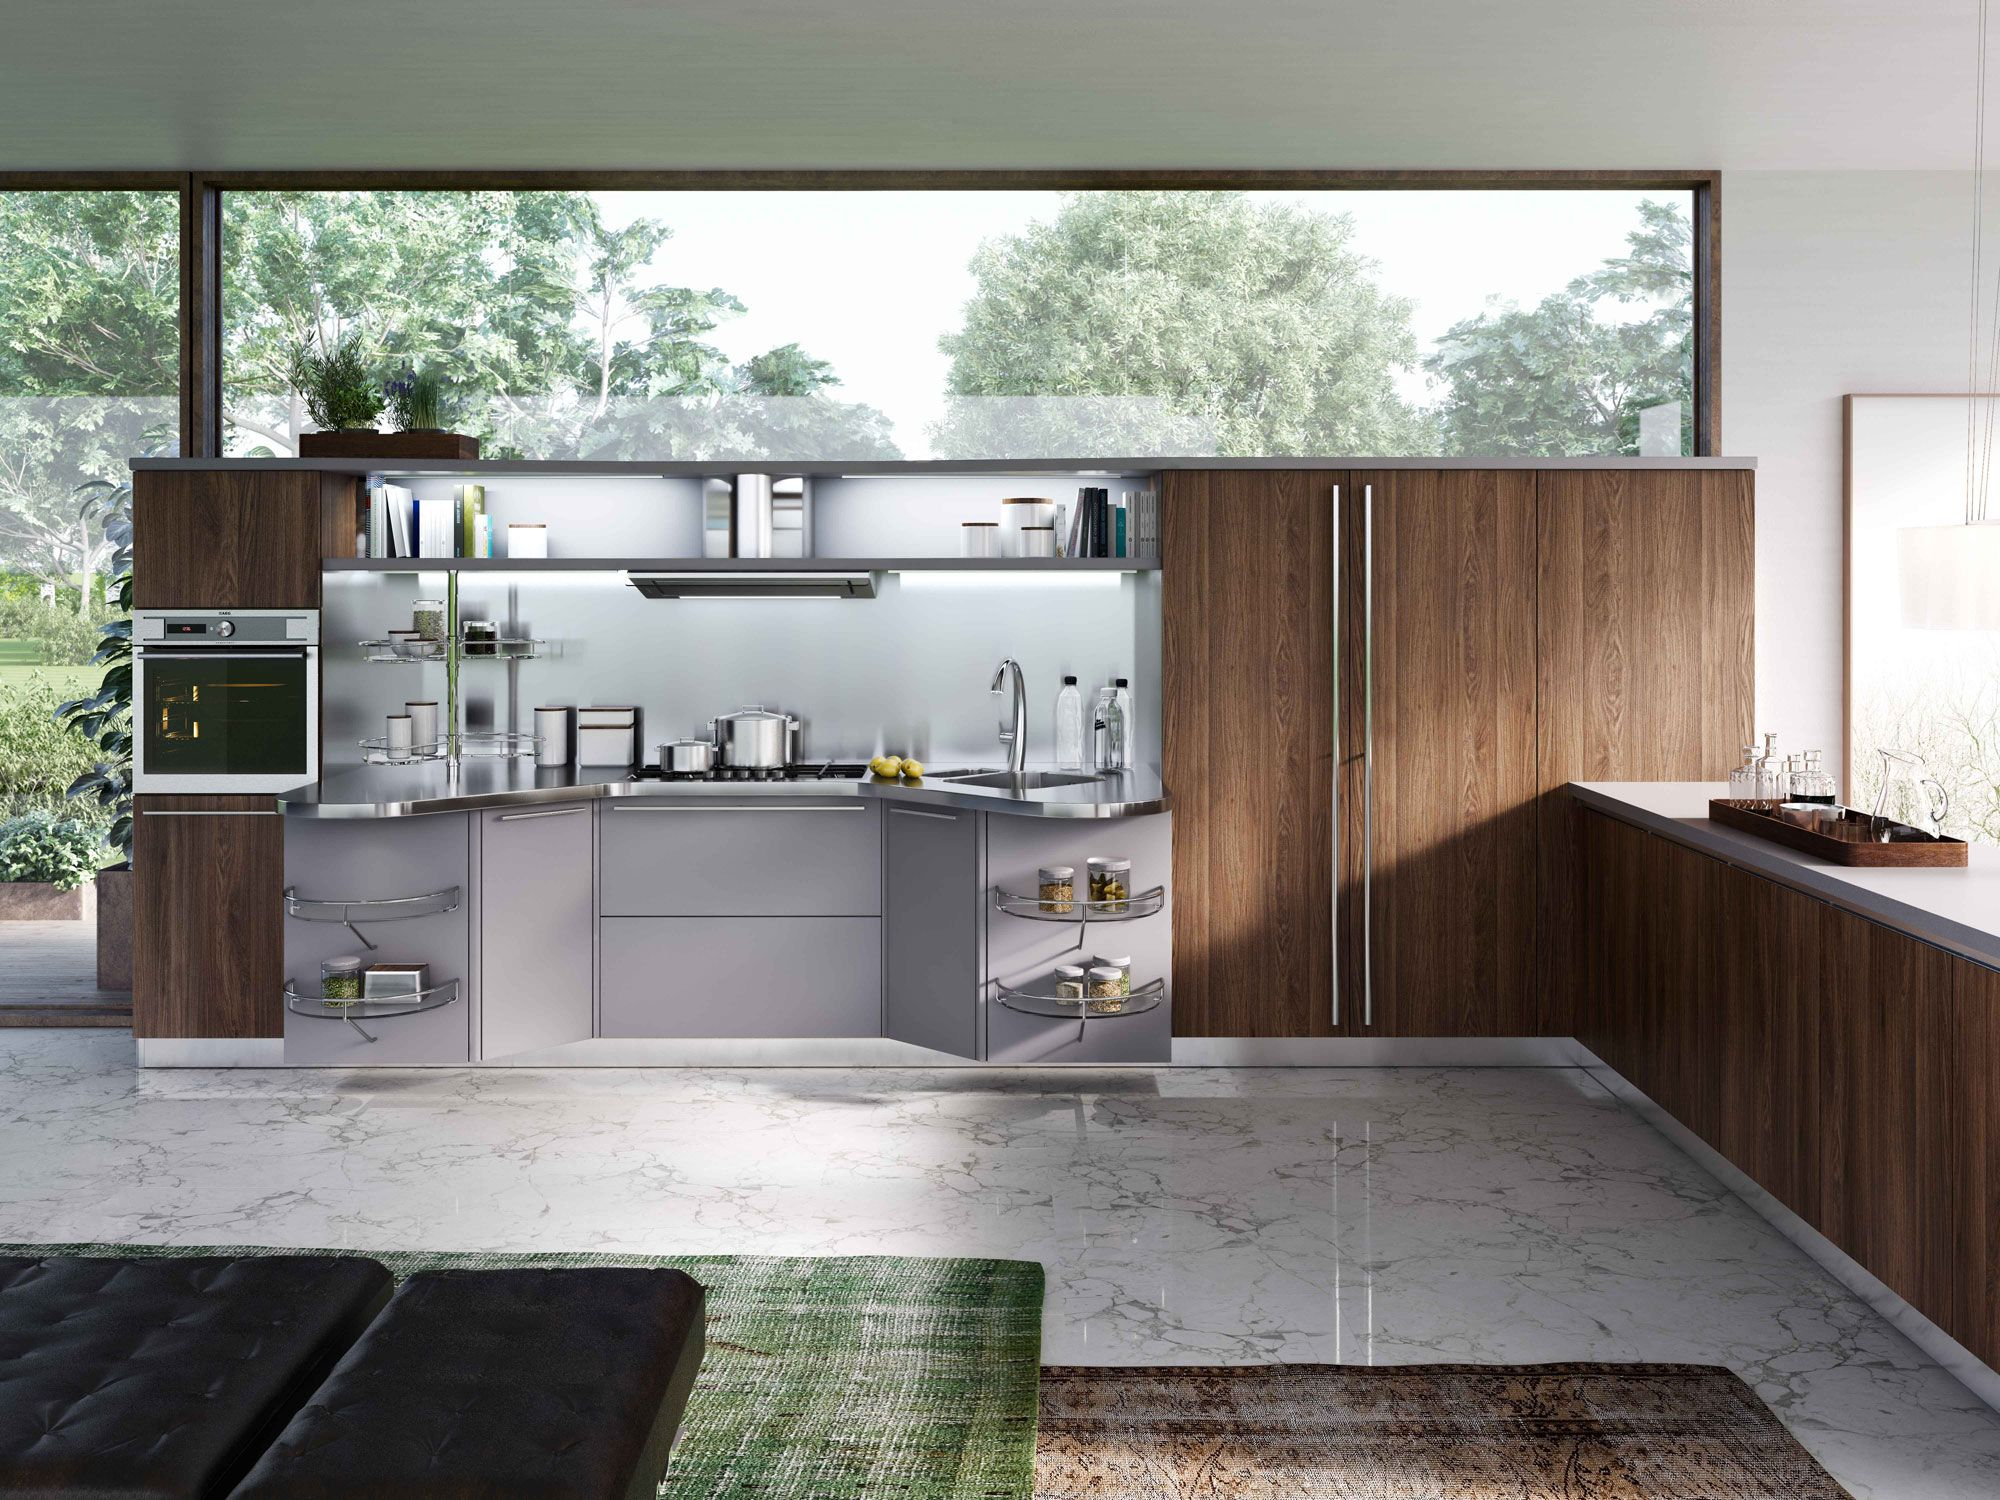 Cucine moderne: cucine design innovative con Skyline 2.0 | Snaidero ...